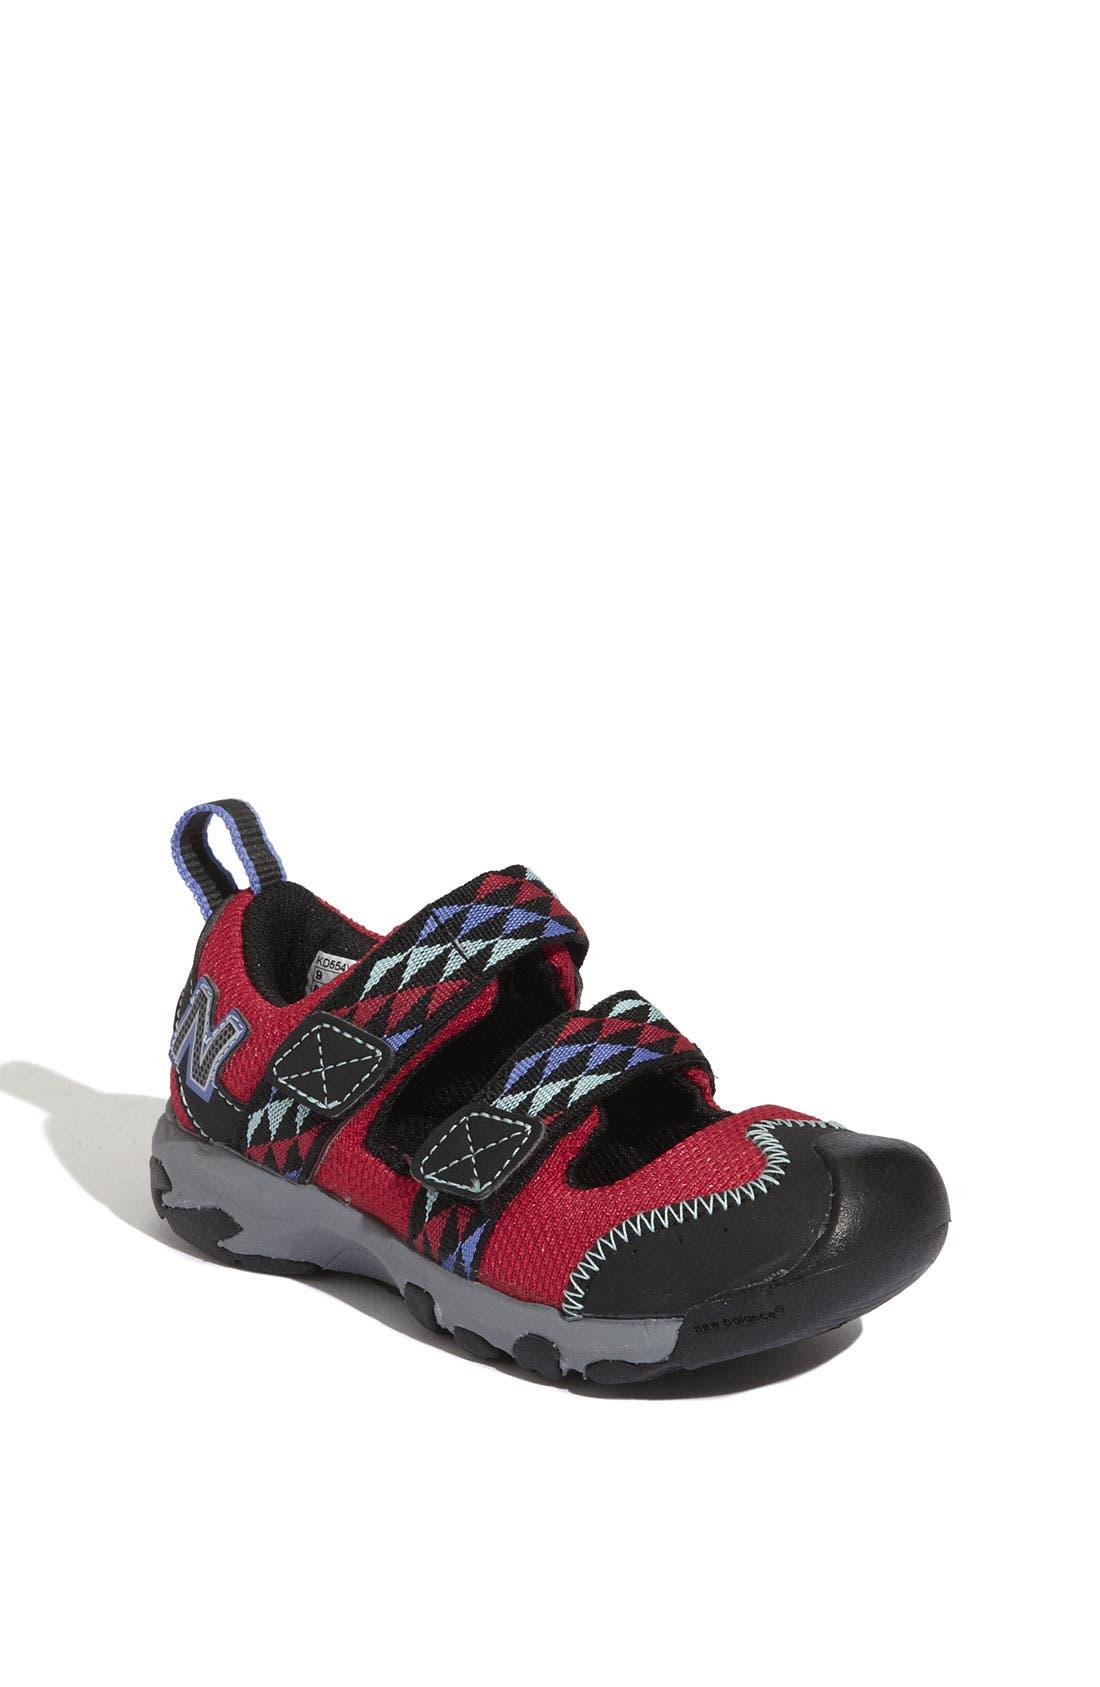 Main Image - New Balance '554' Water Shoe (Walker, Toddler, Little Kid & Big Kid)